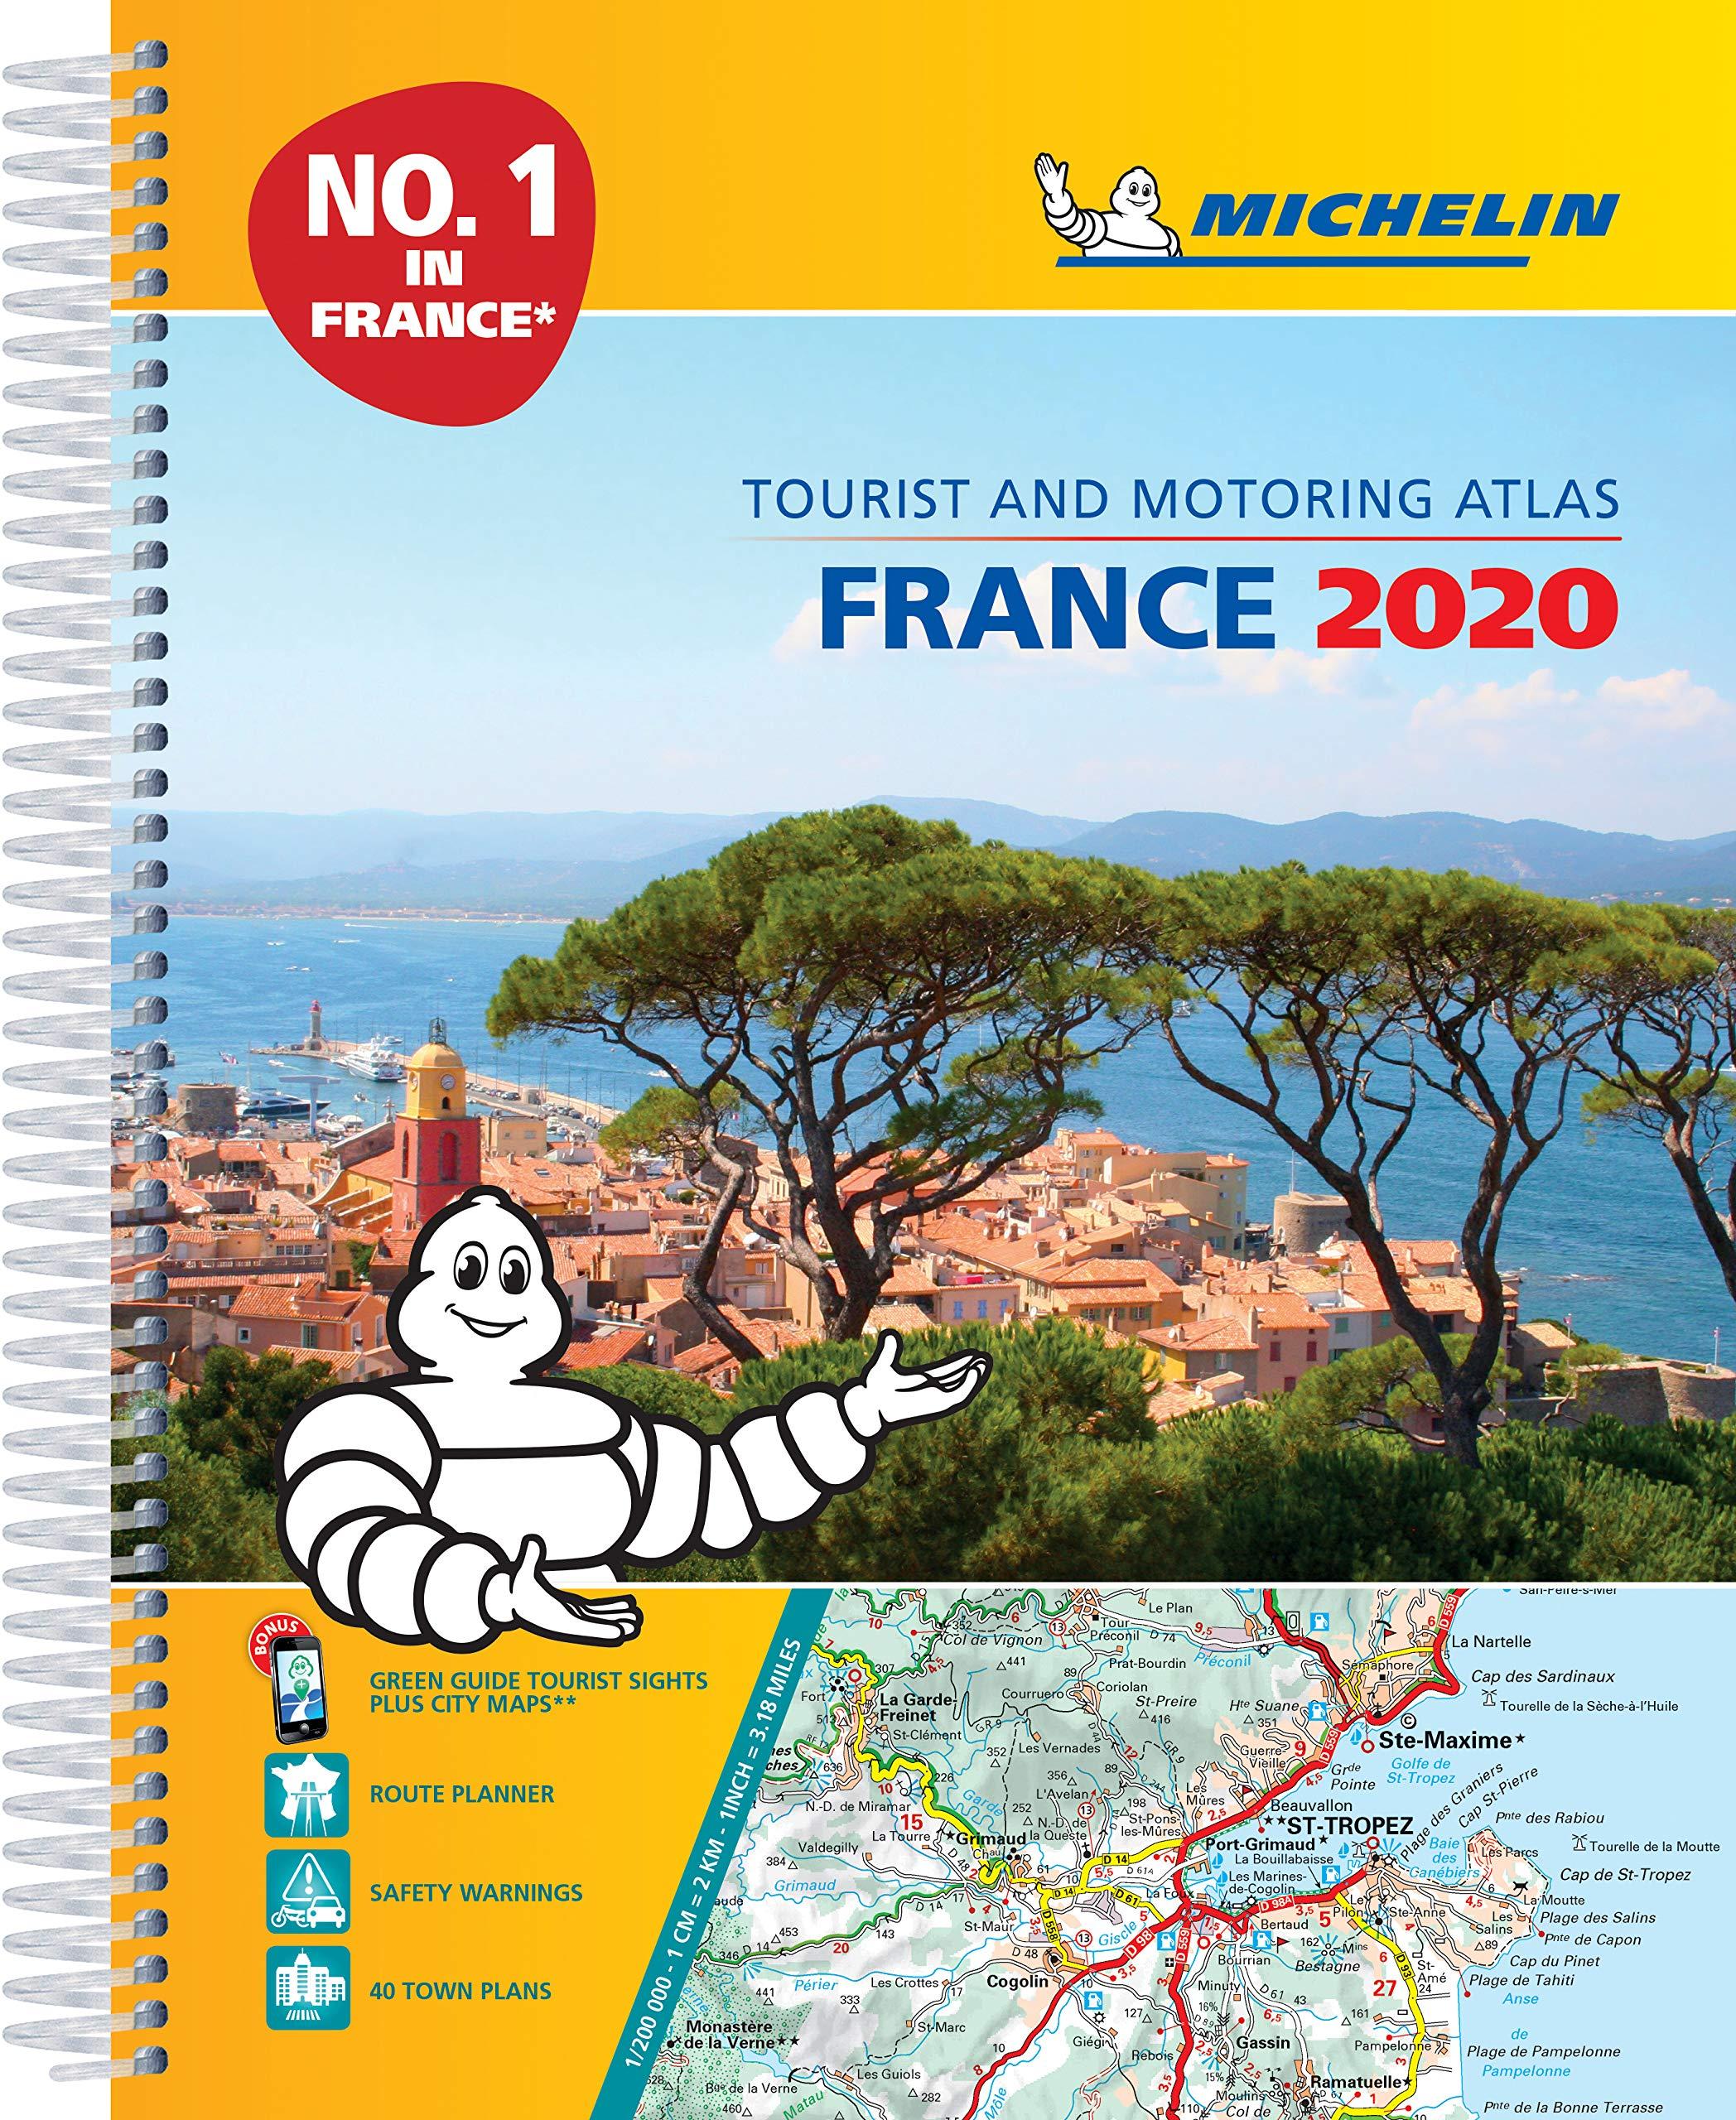 צרפת 197 אטלס 2020 ספירלי A4